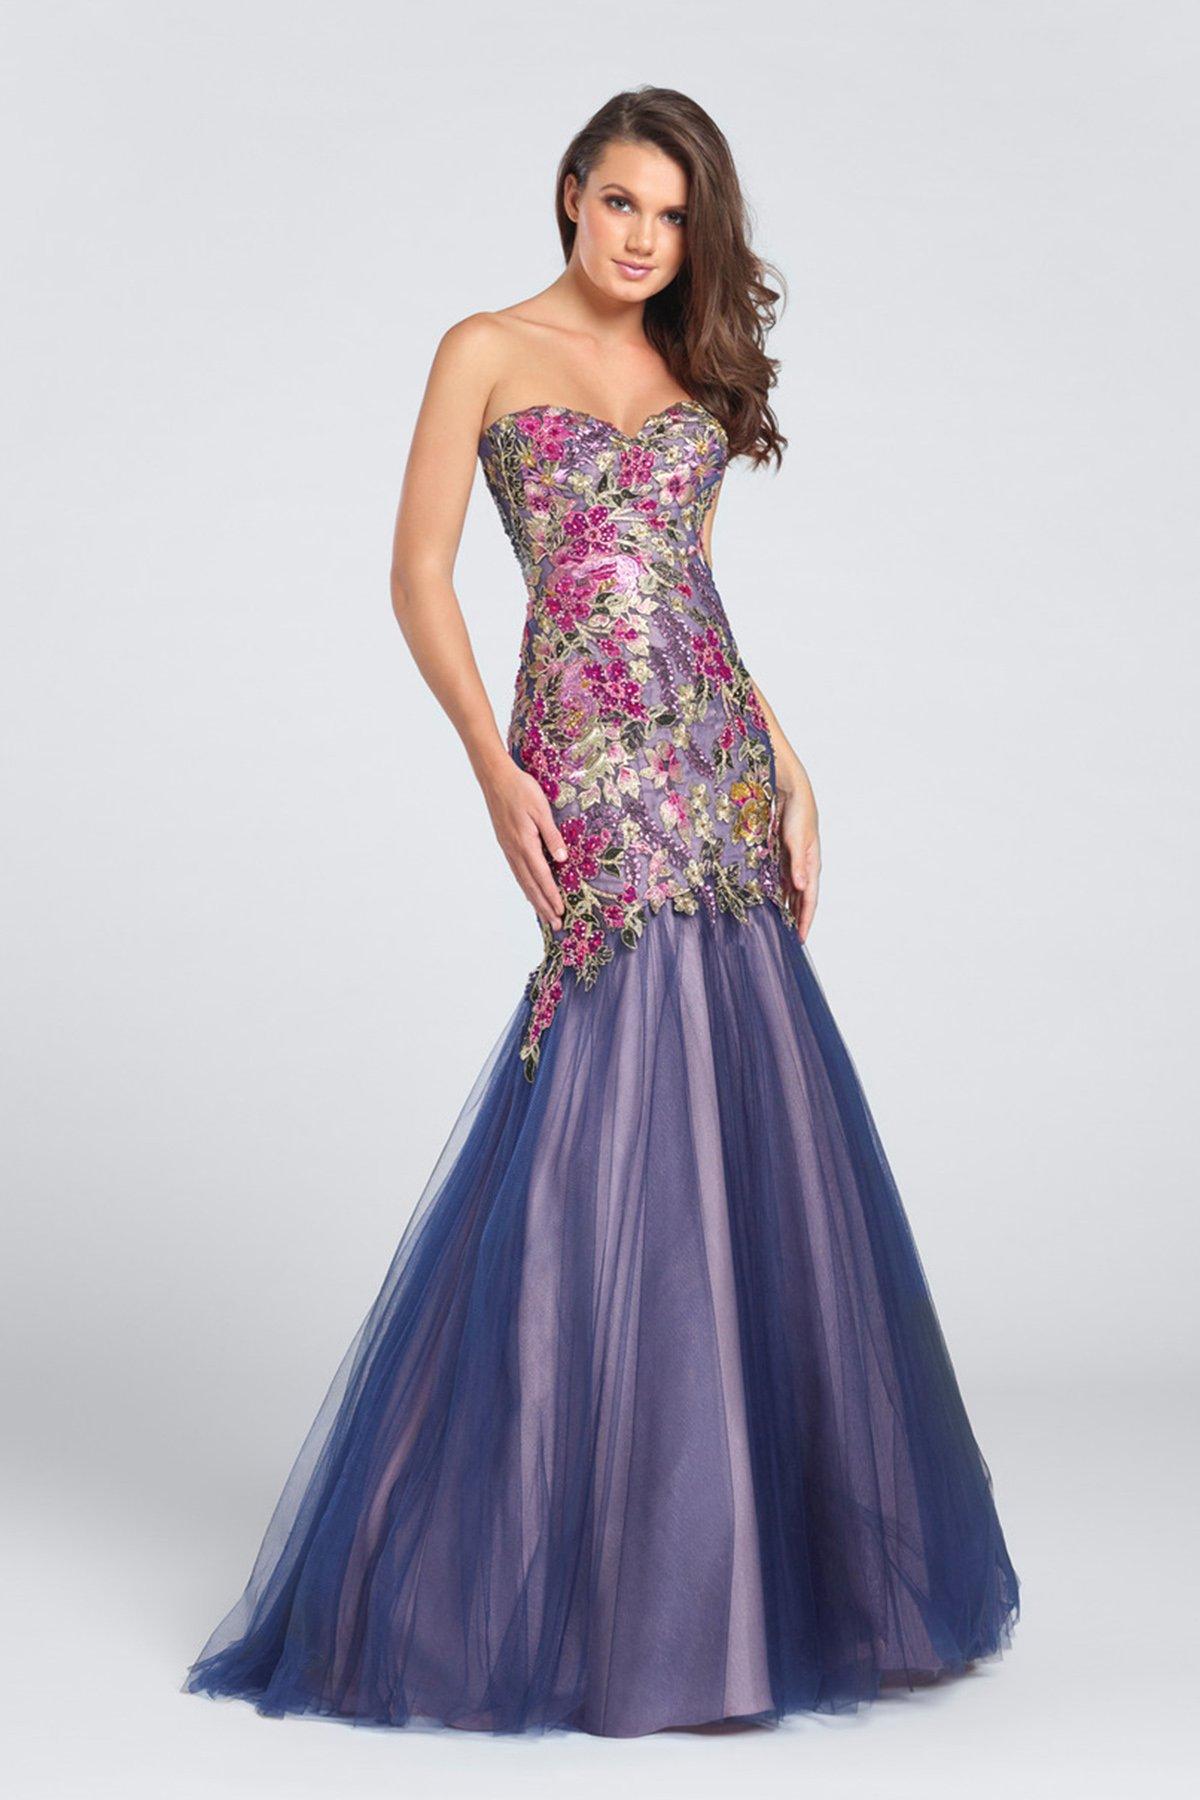 floral bridesmaid dresses ellie wilde EW117152